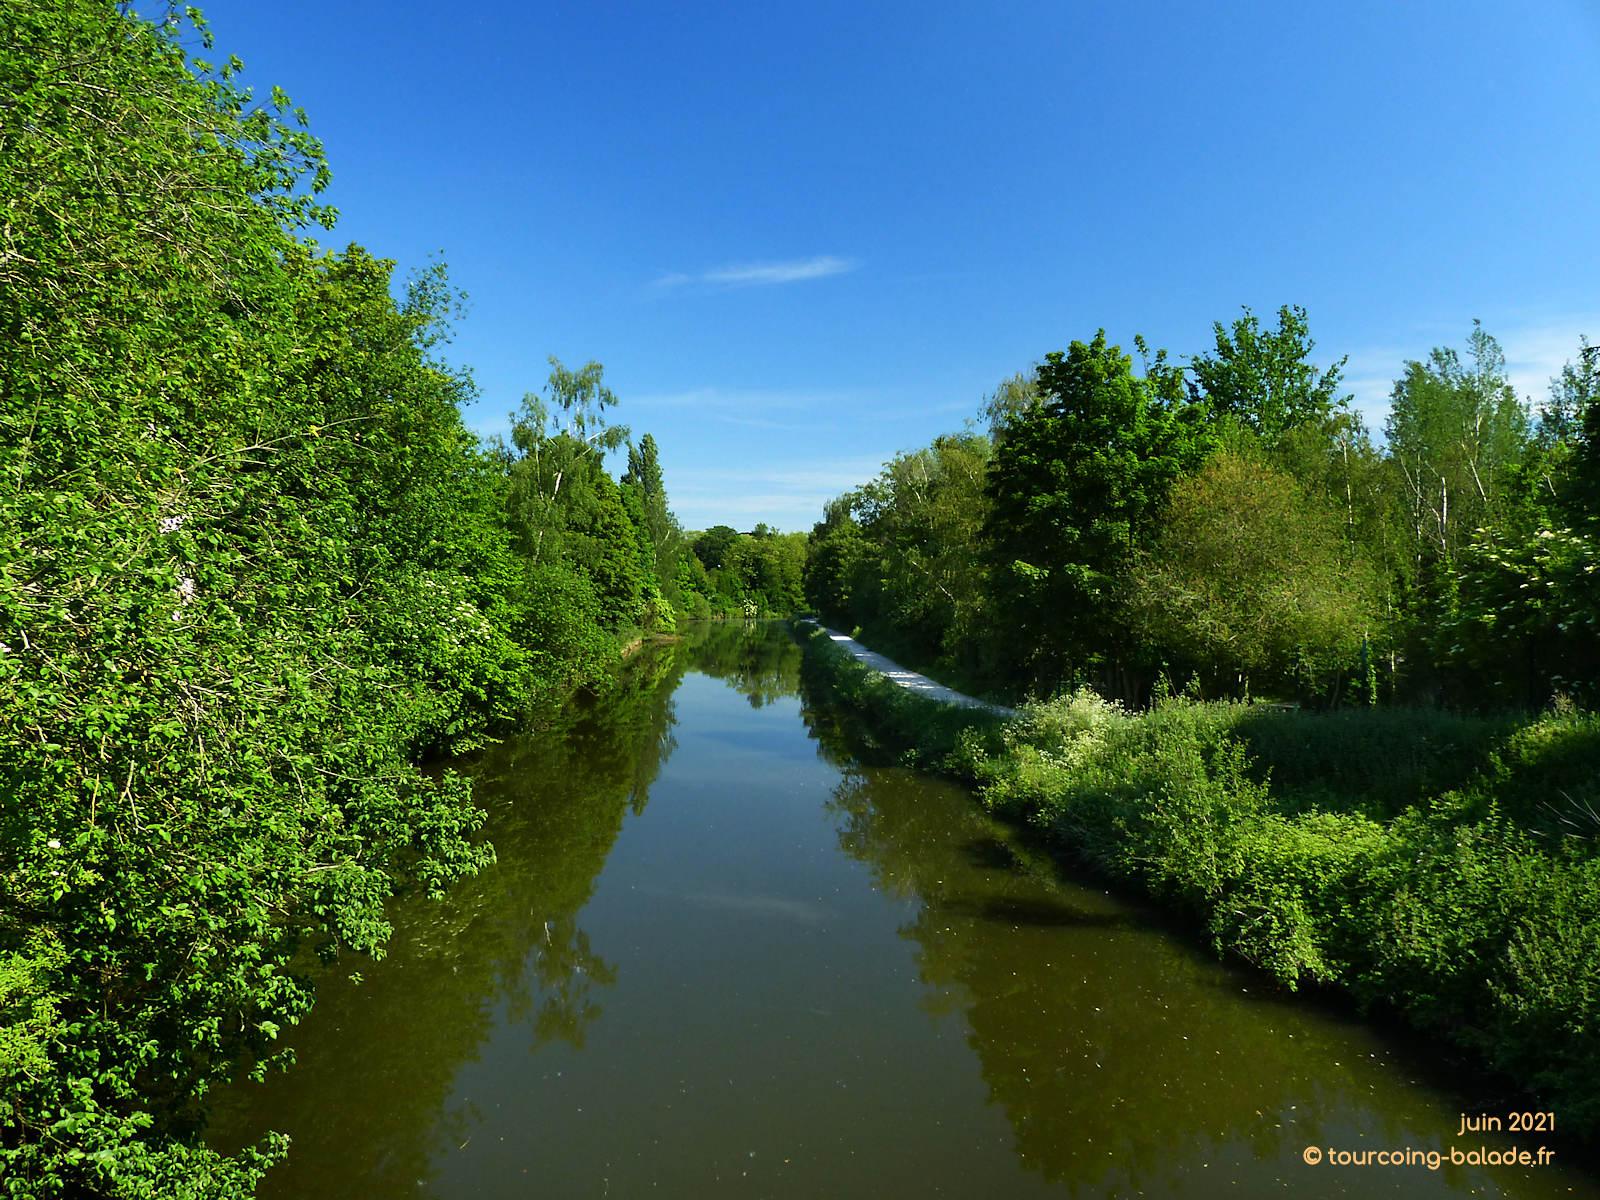 Rivière de la Marque, Marcq-en-Baroeul, 2021